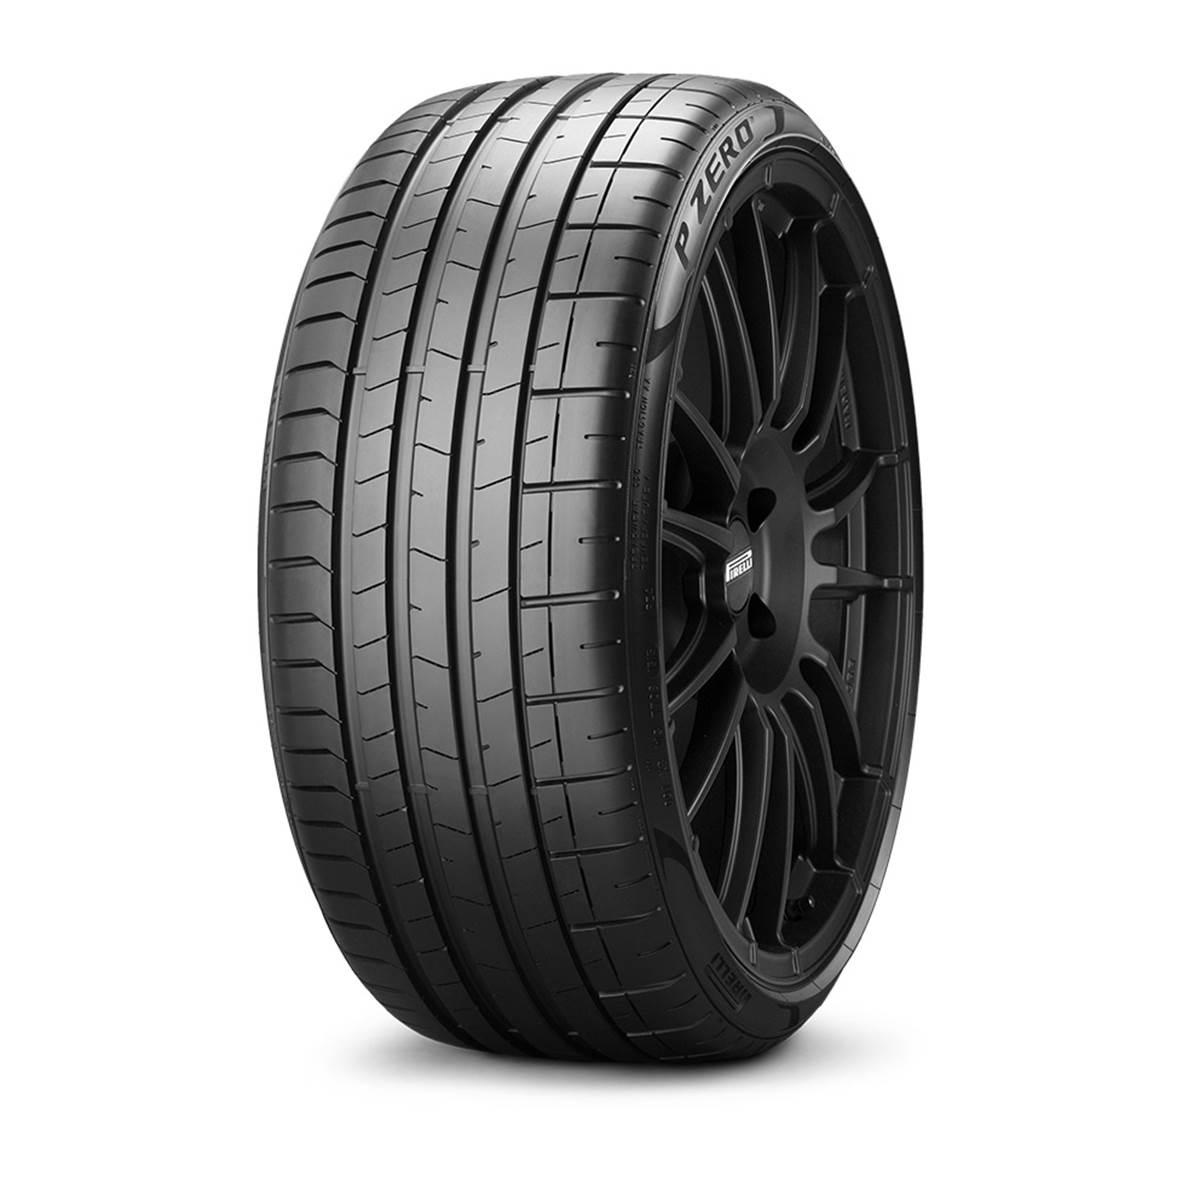 Pneu Pirelli 225/40R18 92Y P-Zero homologué Audi XL